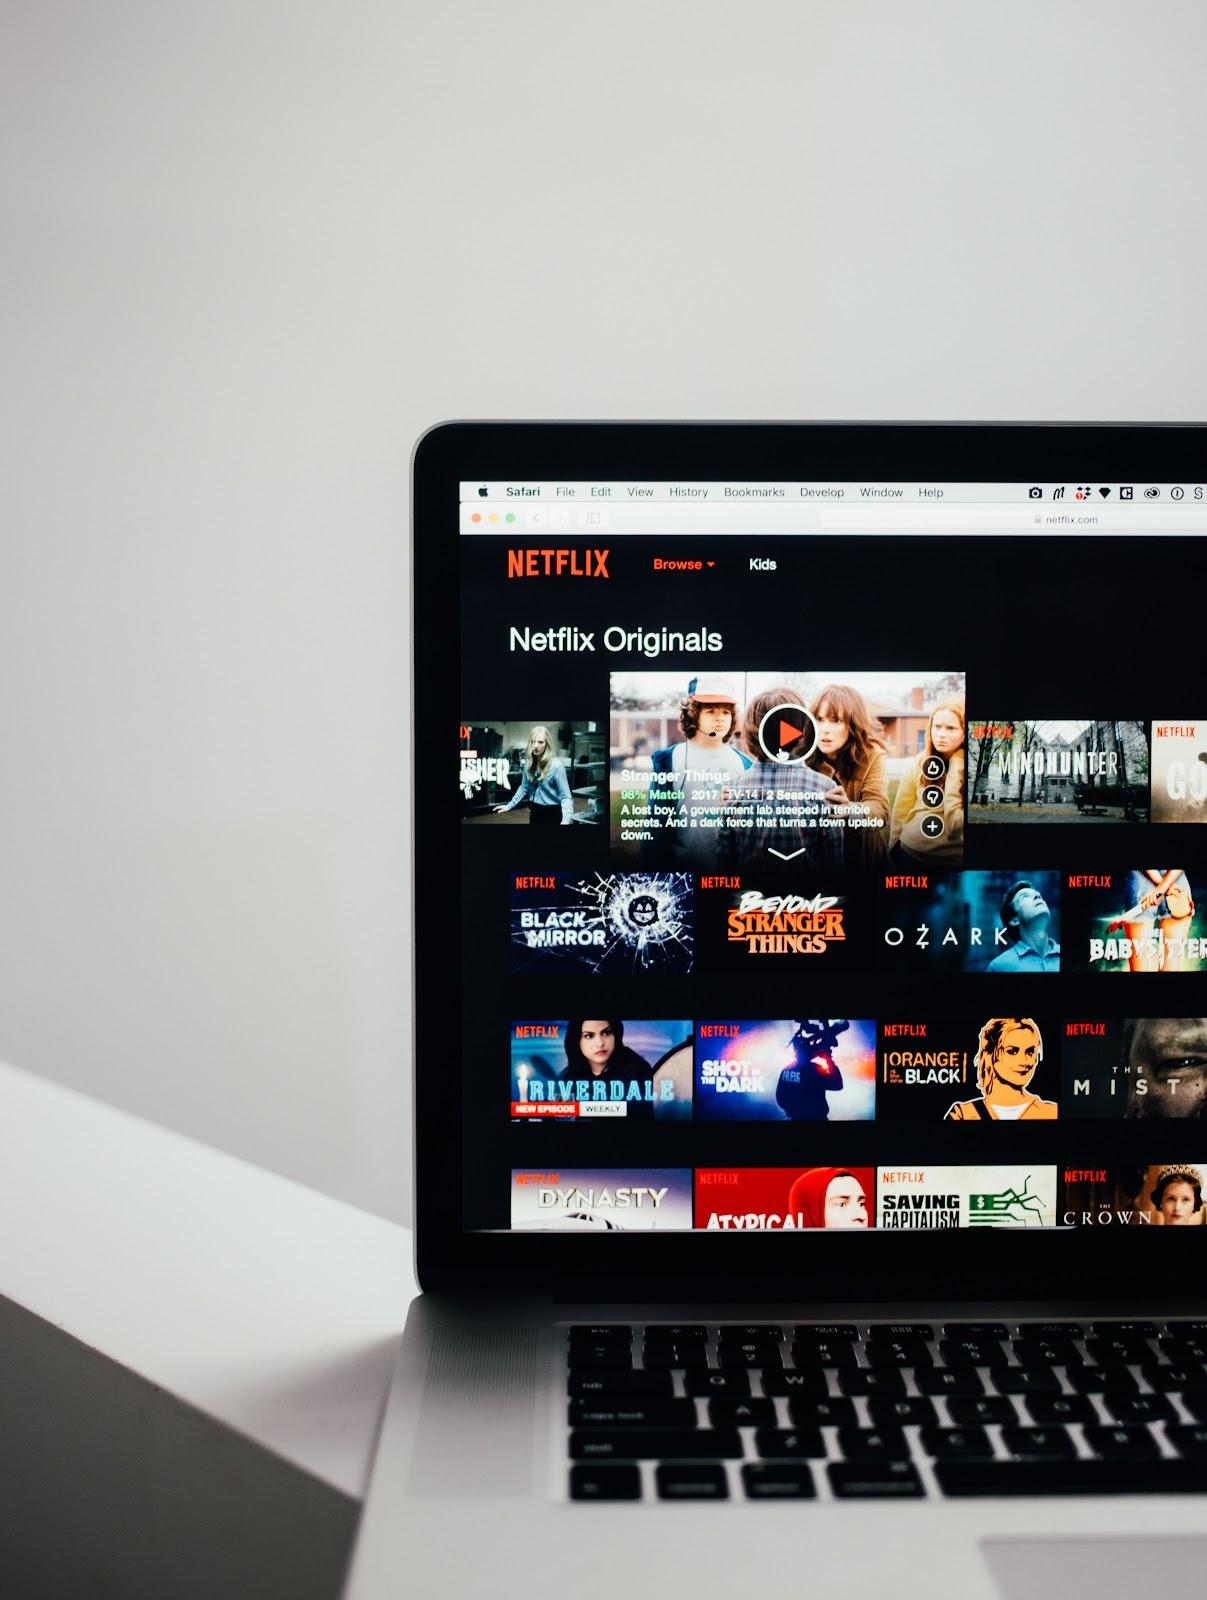 Netflix.com homepage on a laptop